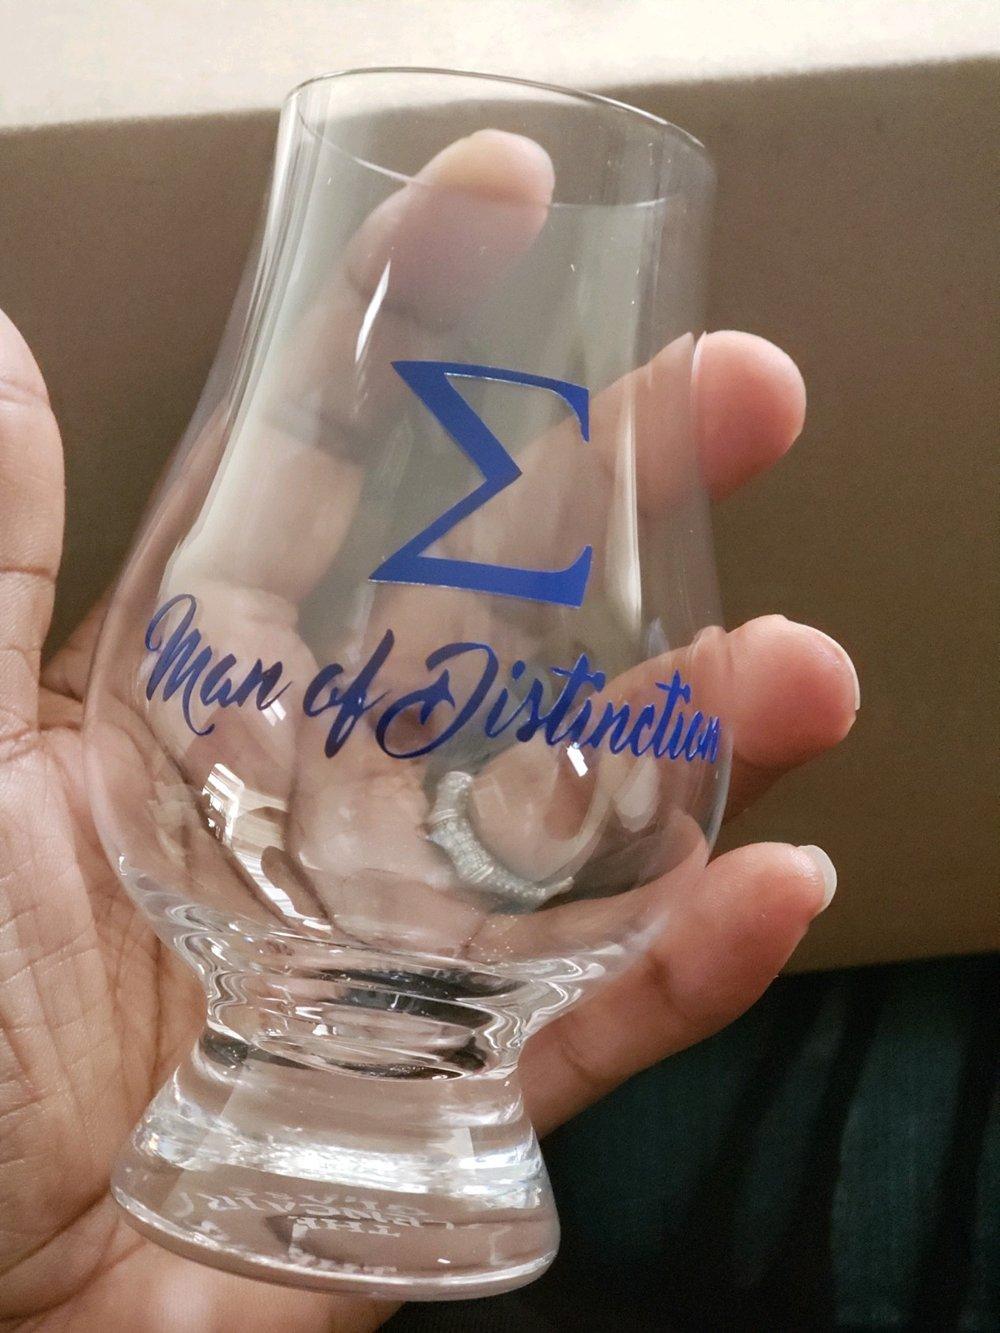 Sigma Man of Distinction - Glencairn Whisky Glass